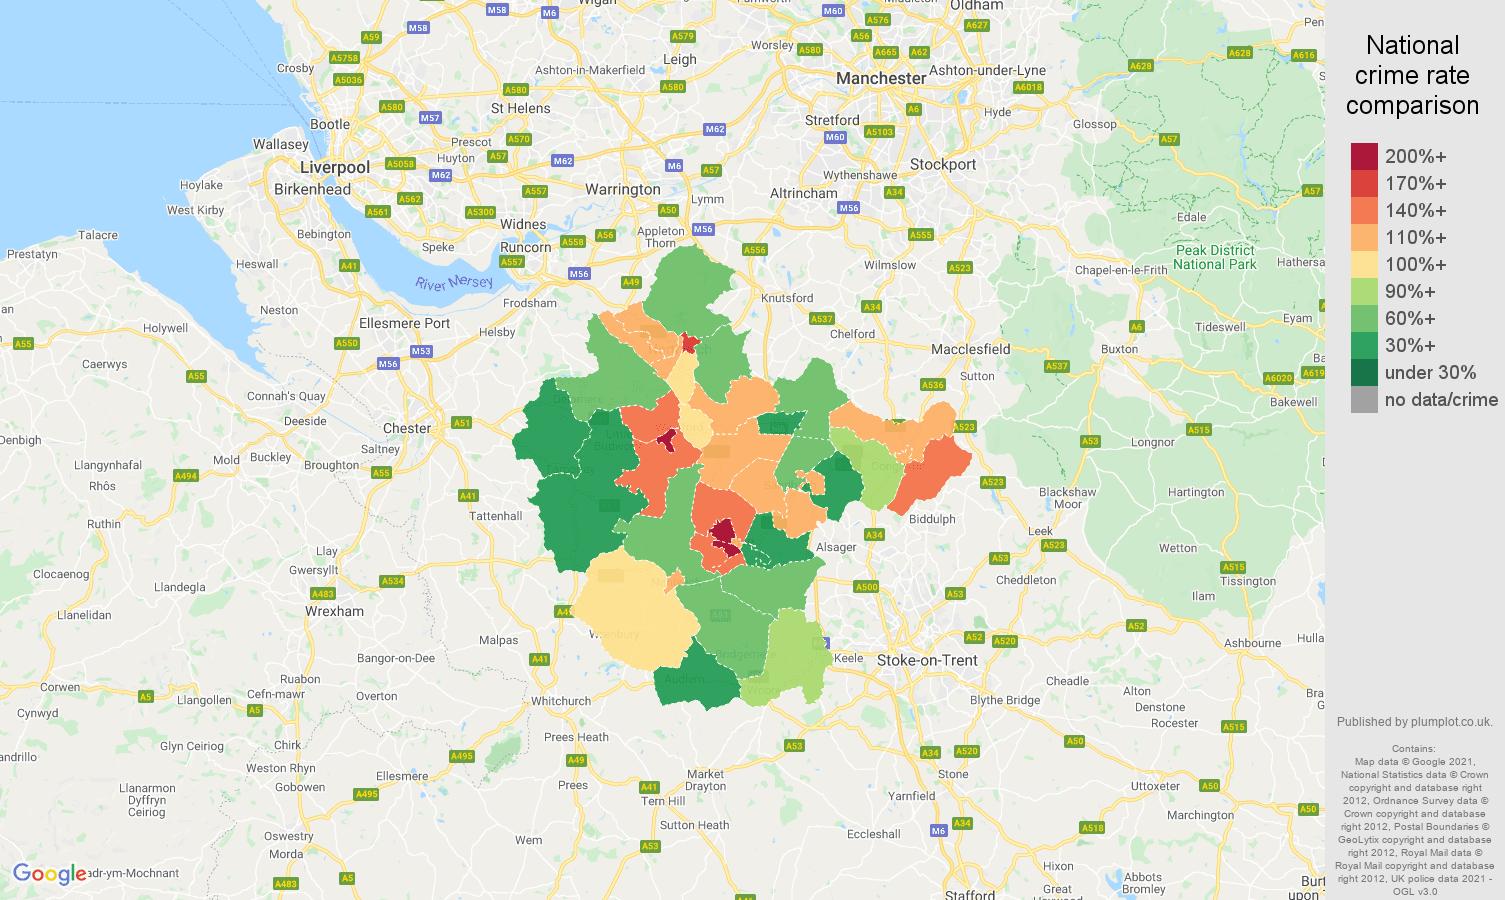 Crewe violent crime rate comparison map